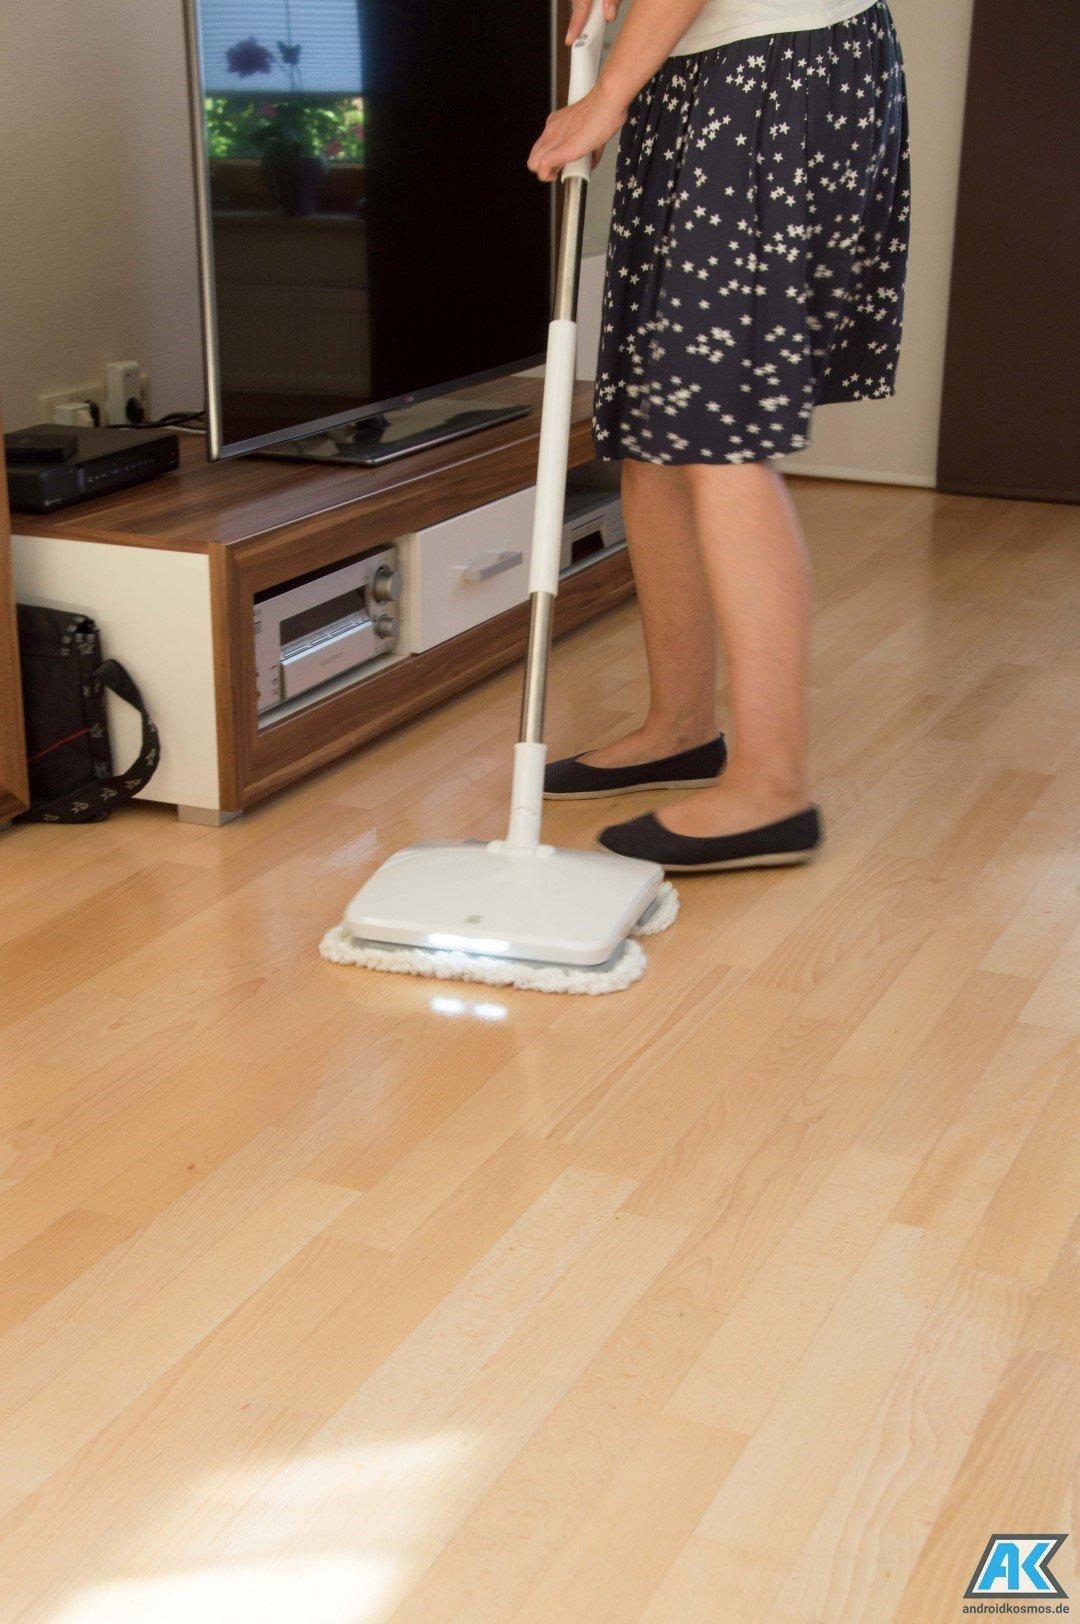 xiaomi mi elektrischer wischmopp im test handheld electric mop. Black Bedroom Furniture Sets. Home Design Ideas